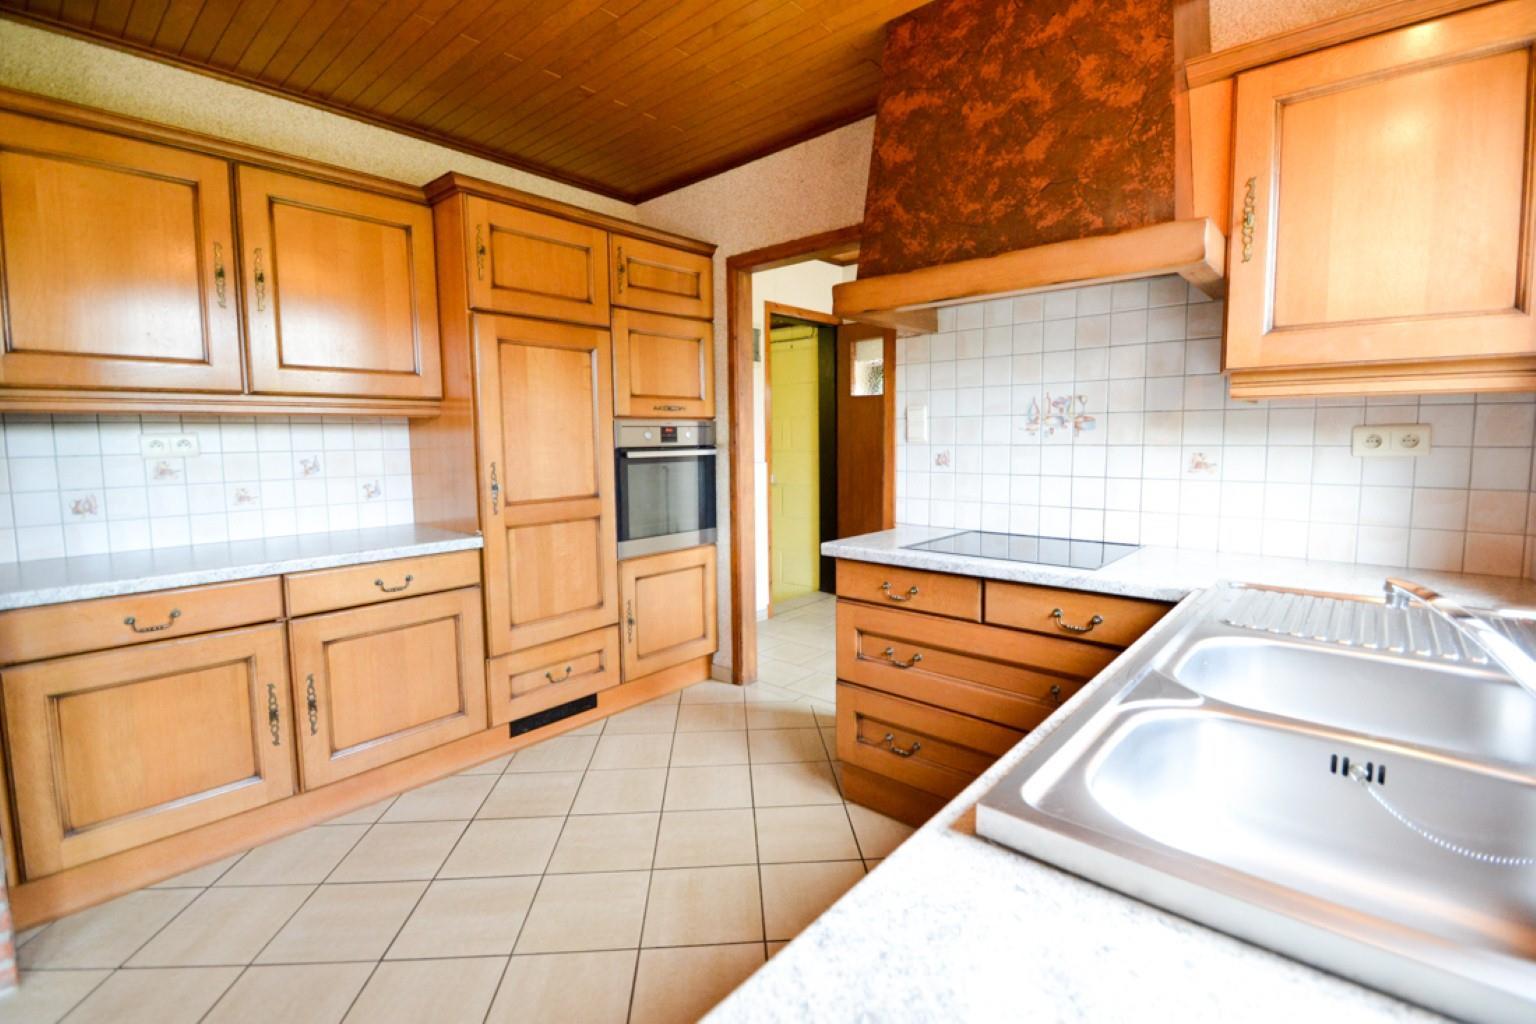 Maison - Leval-Trahegnies - #3049397-4